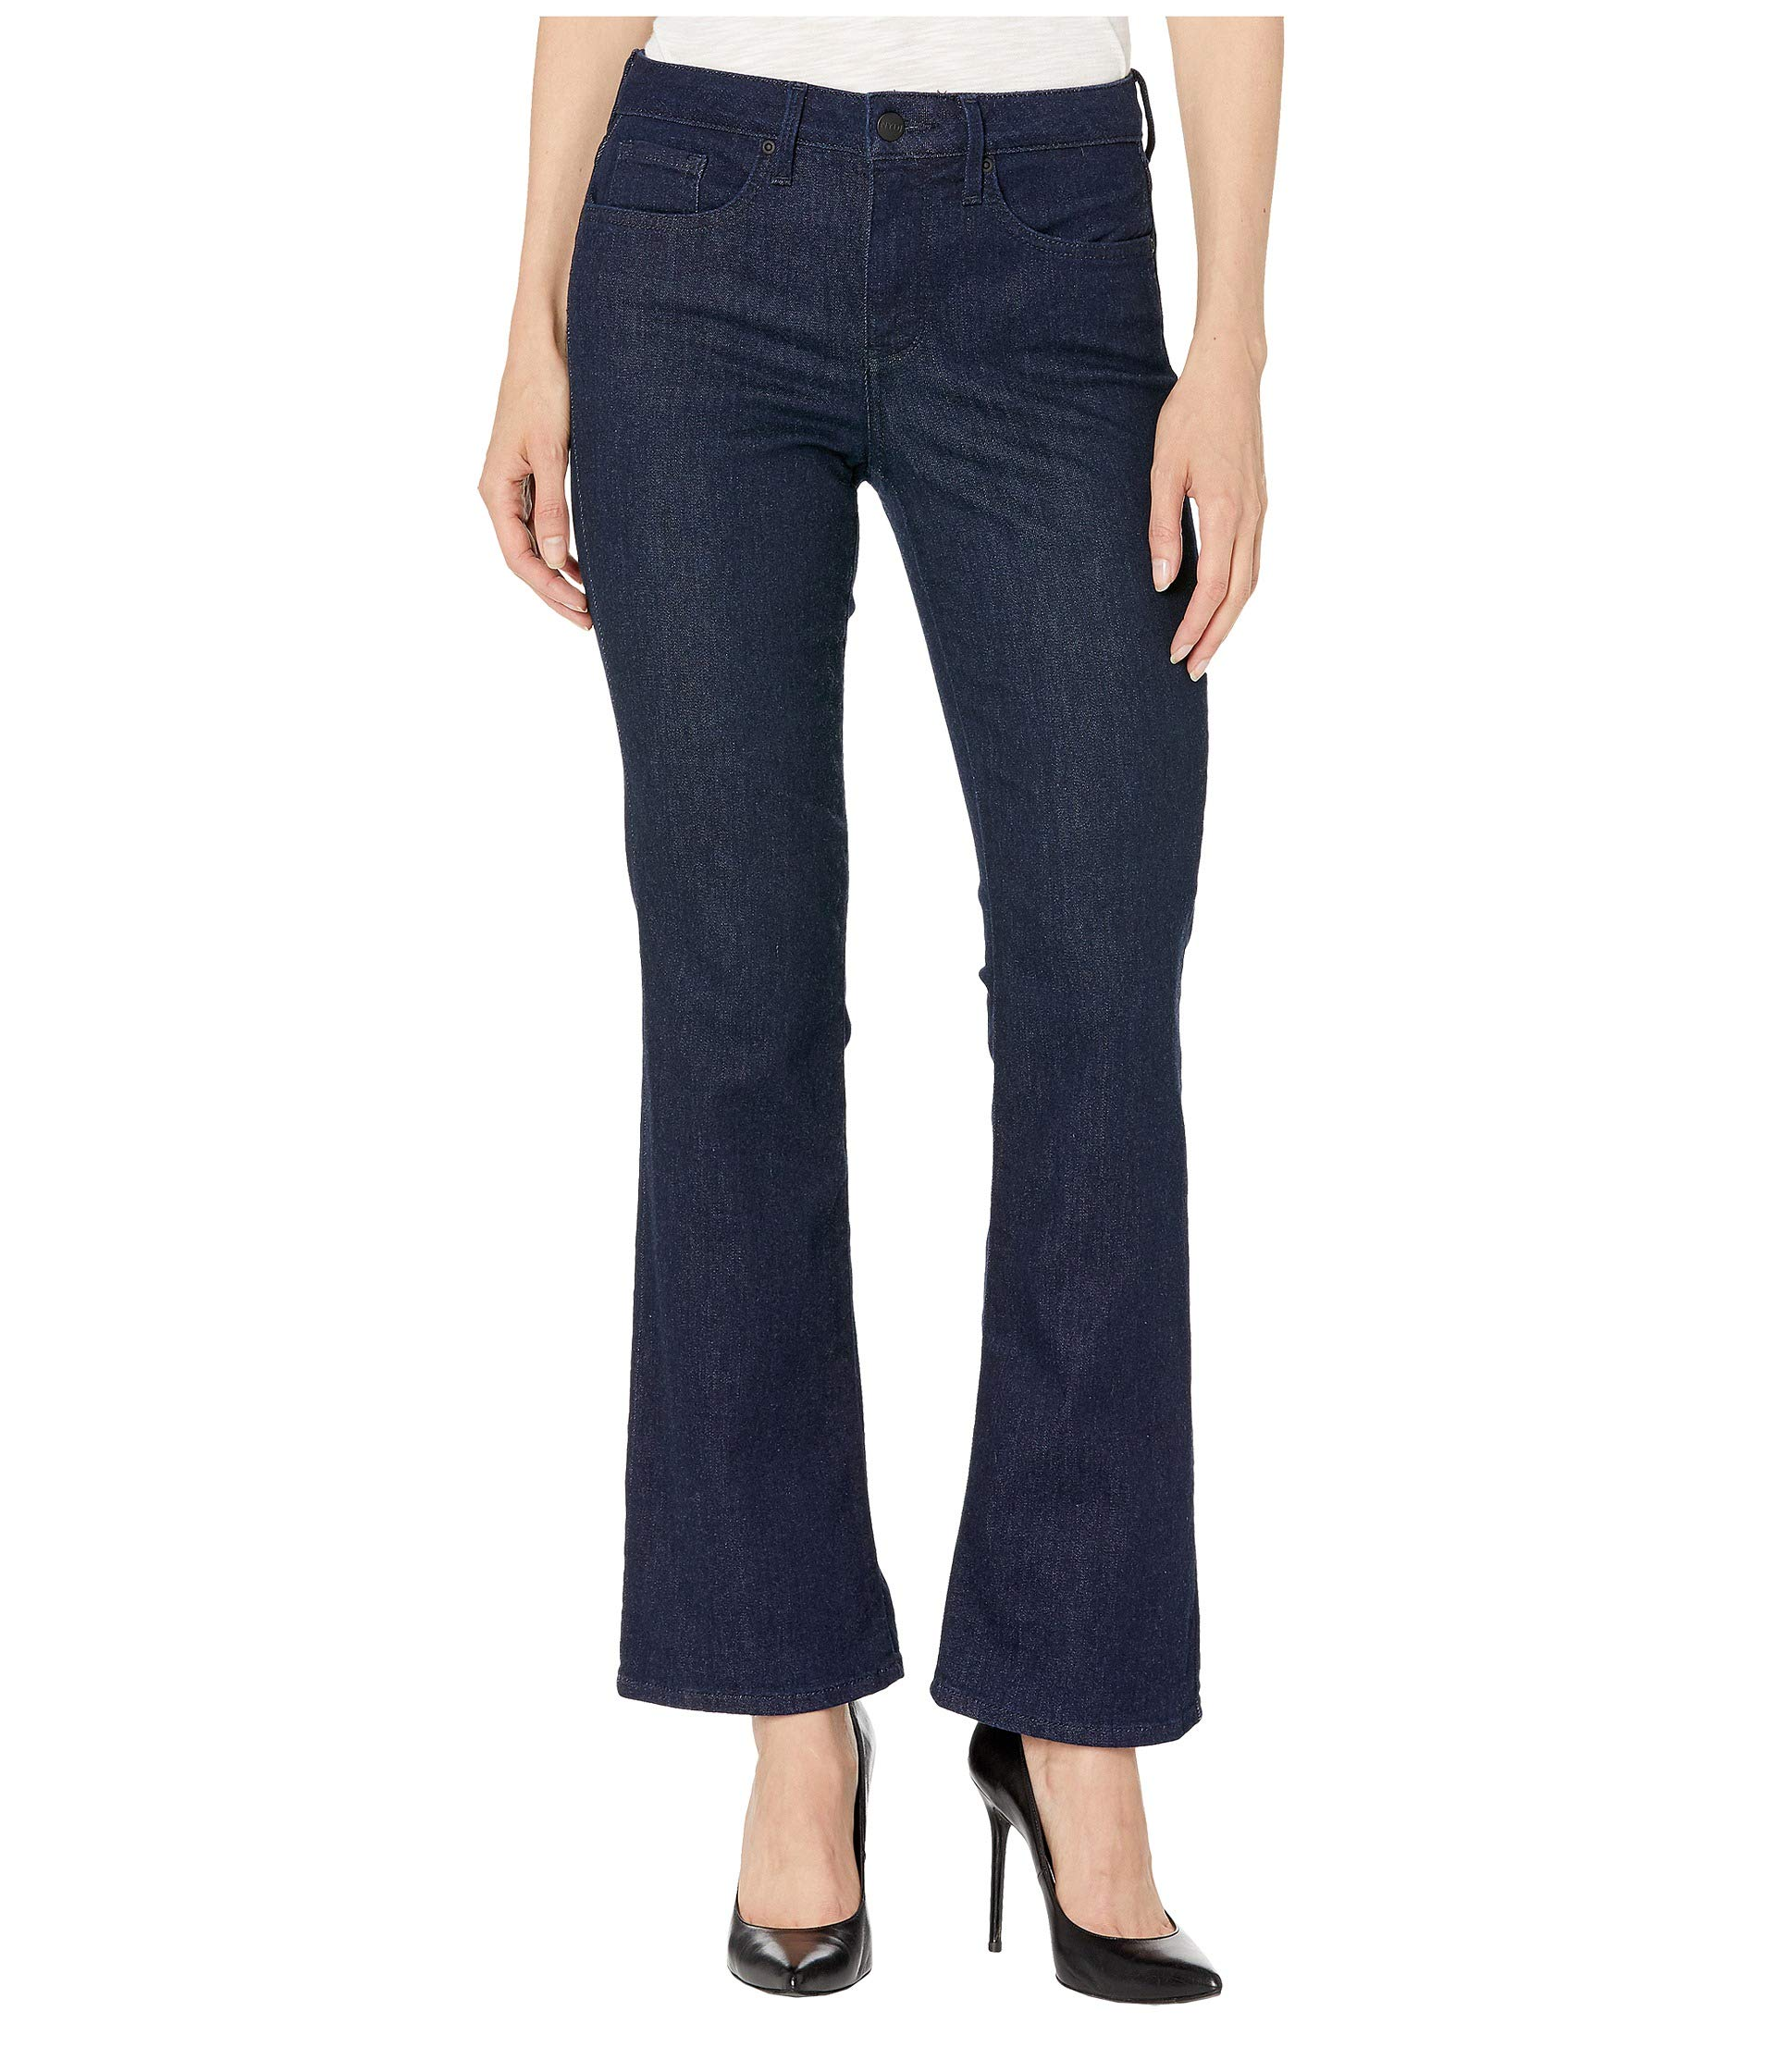 NYDJ Women's Barbara Bootcut Jeans, RINSE, 18 Short by NYDJ